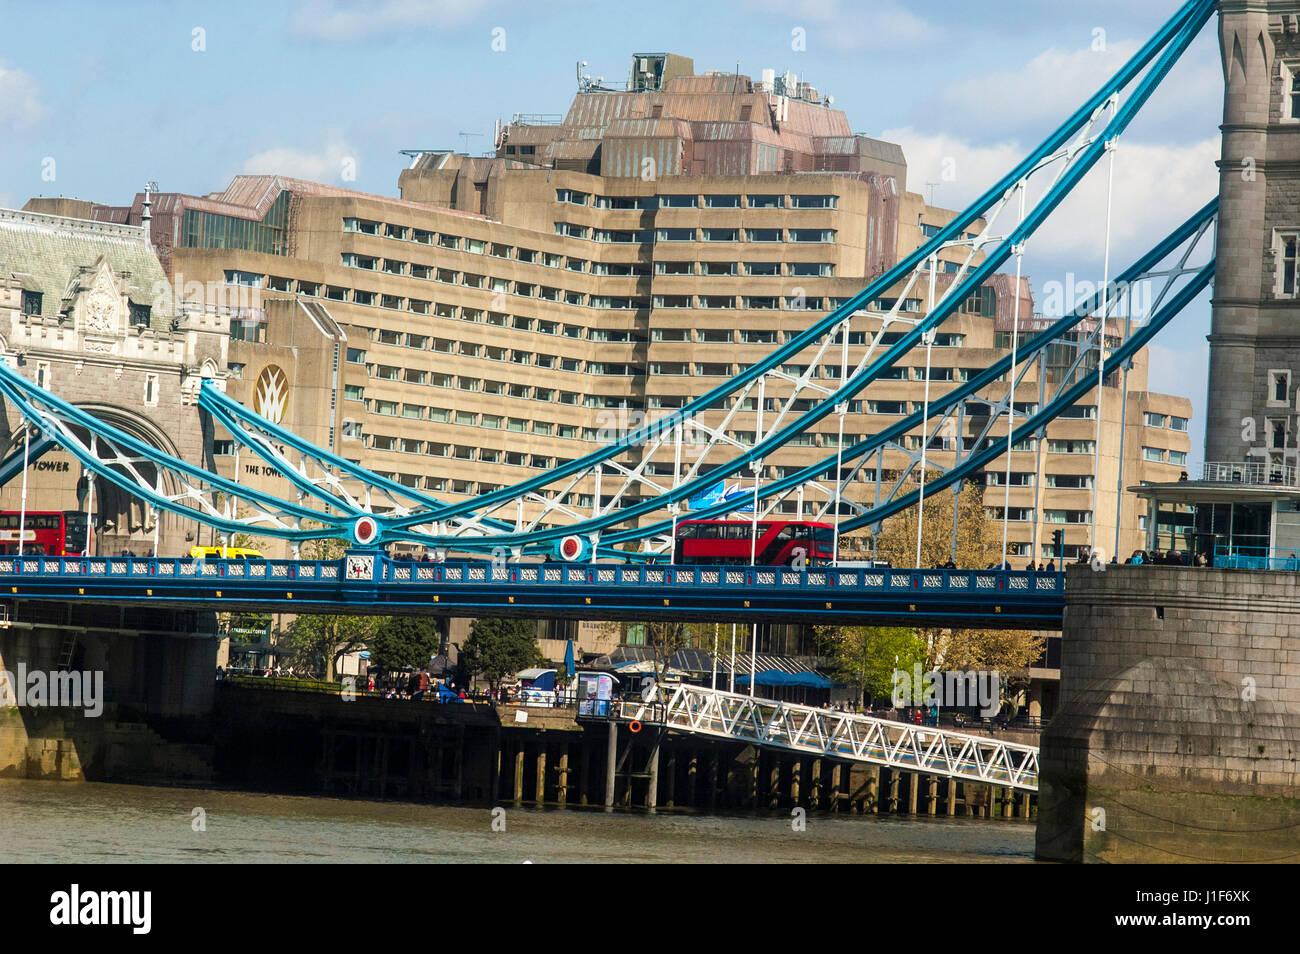 Tower Hotel London St Katharines Way